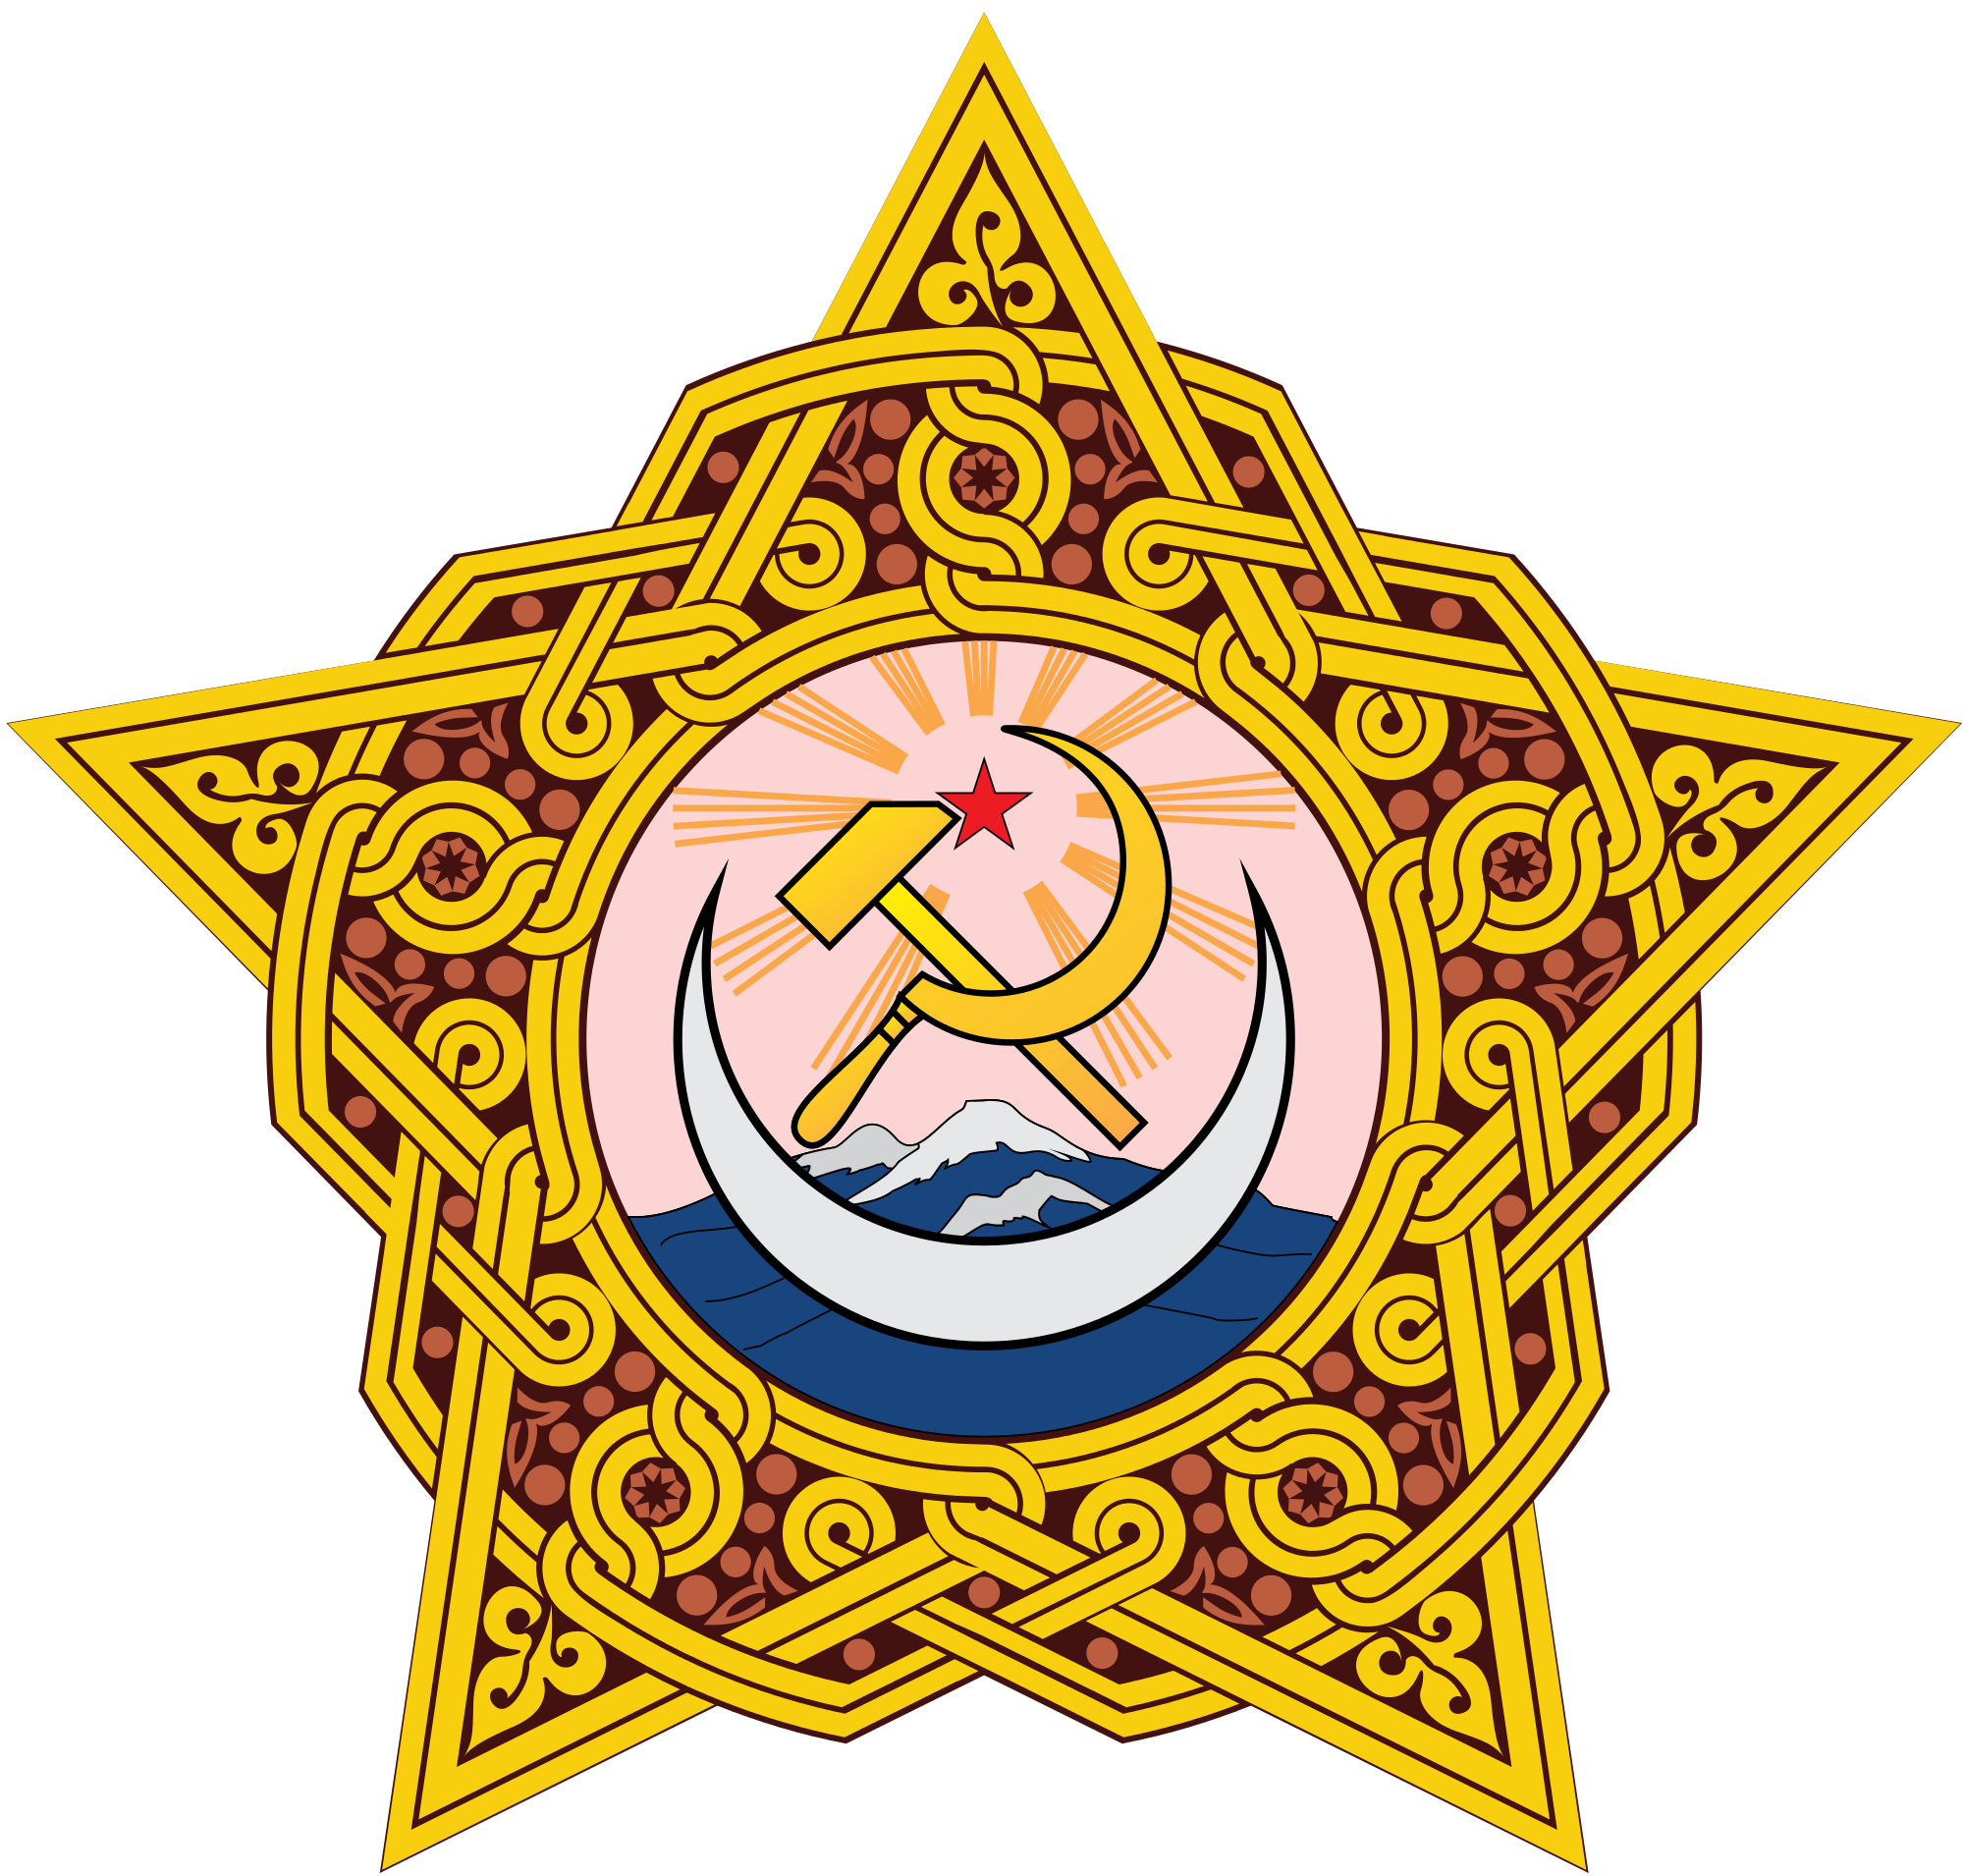 Kola crown clipart jpg transparent download Transcaucasian Socialist Federative Soviet Republic (1922-1924 ... jpg transparent download